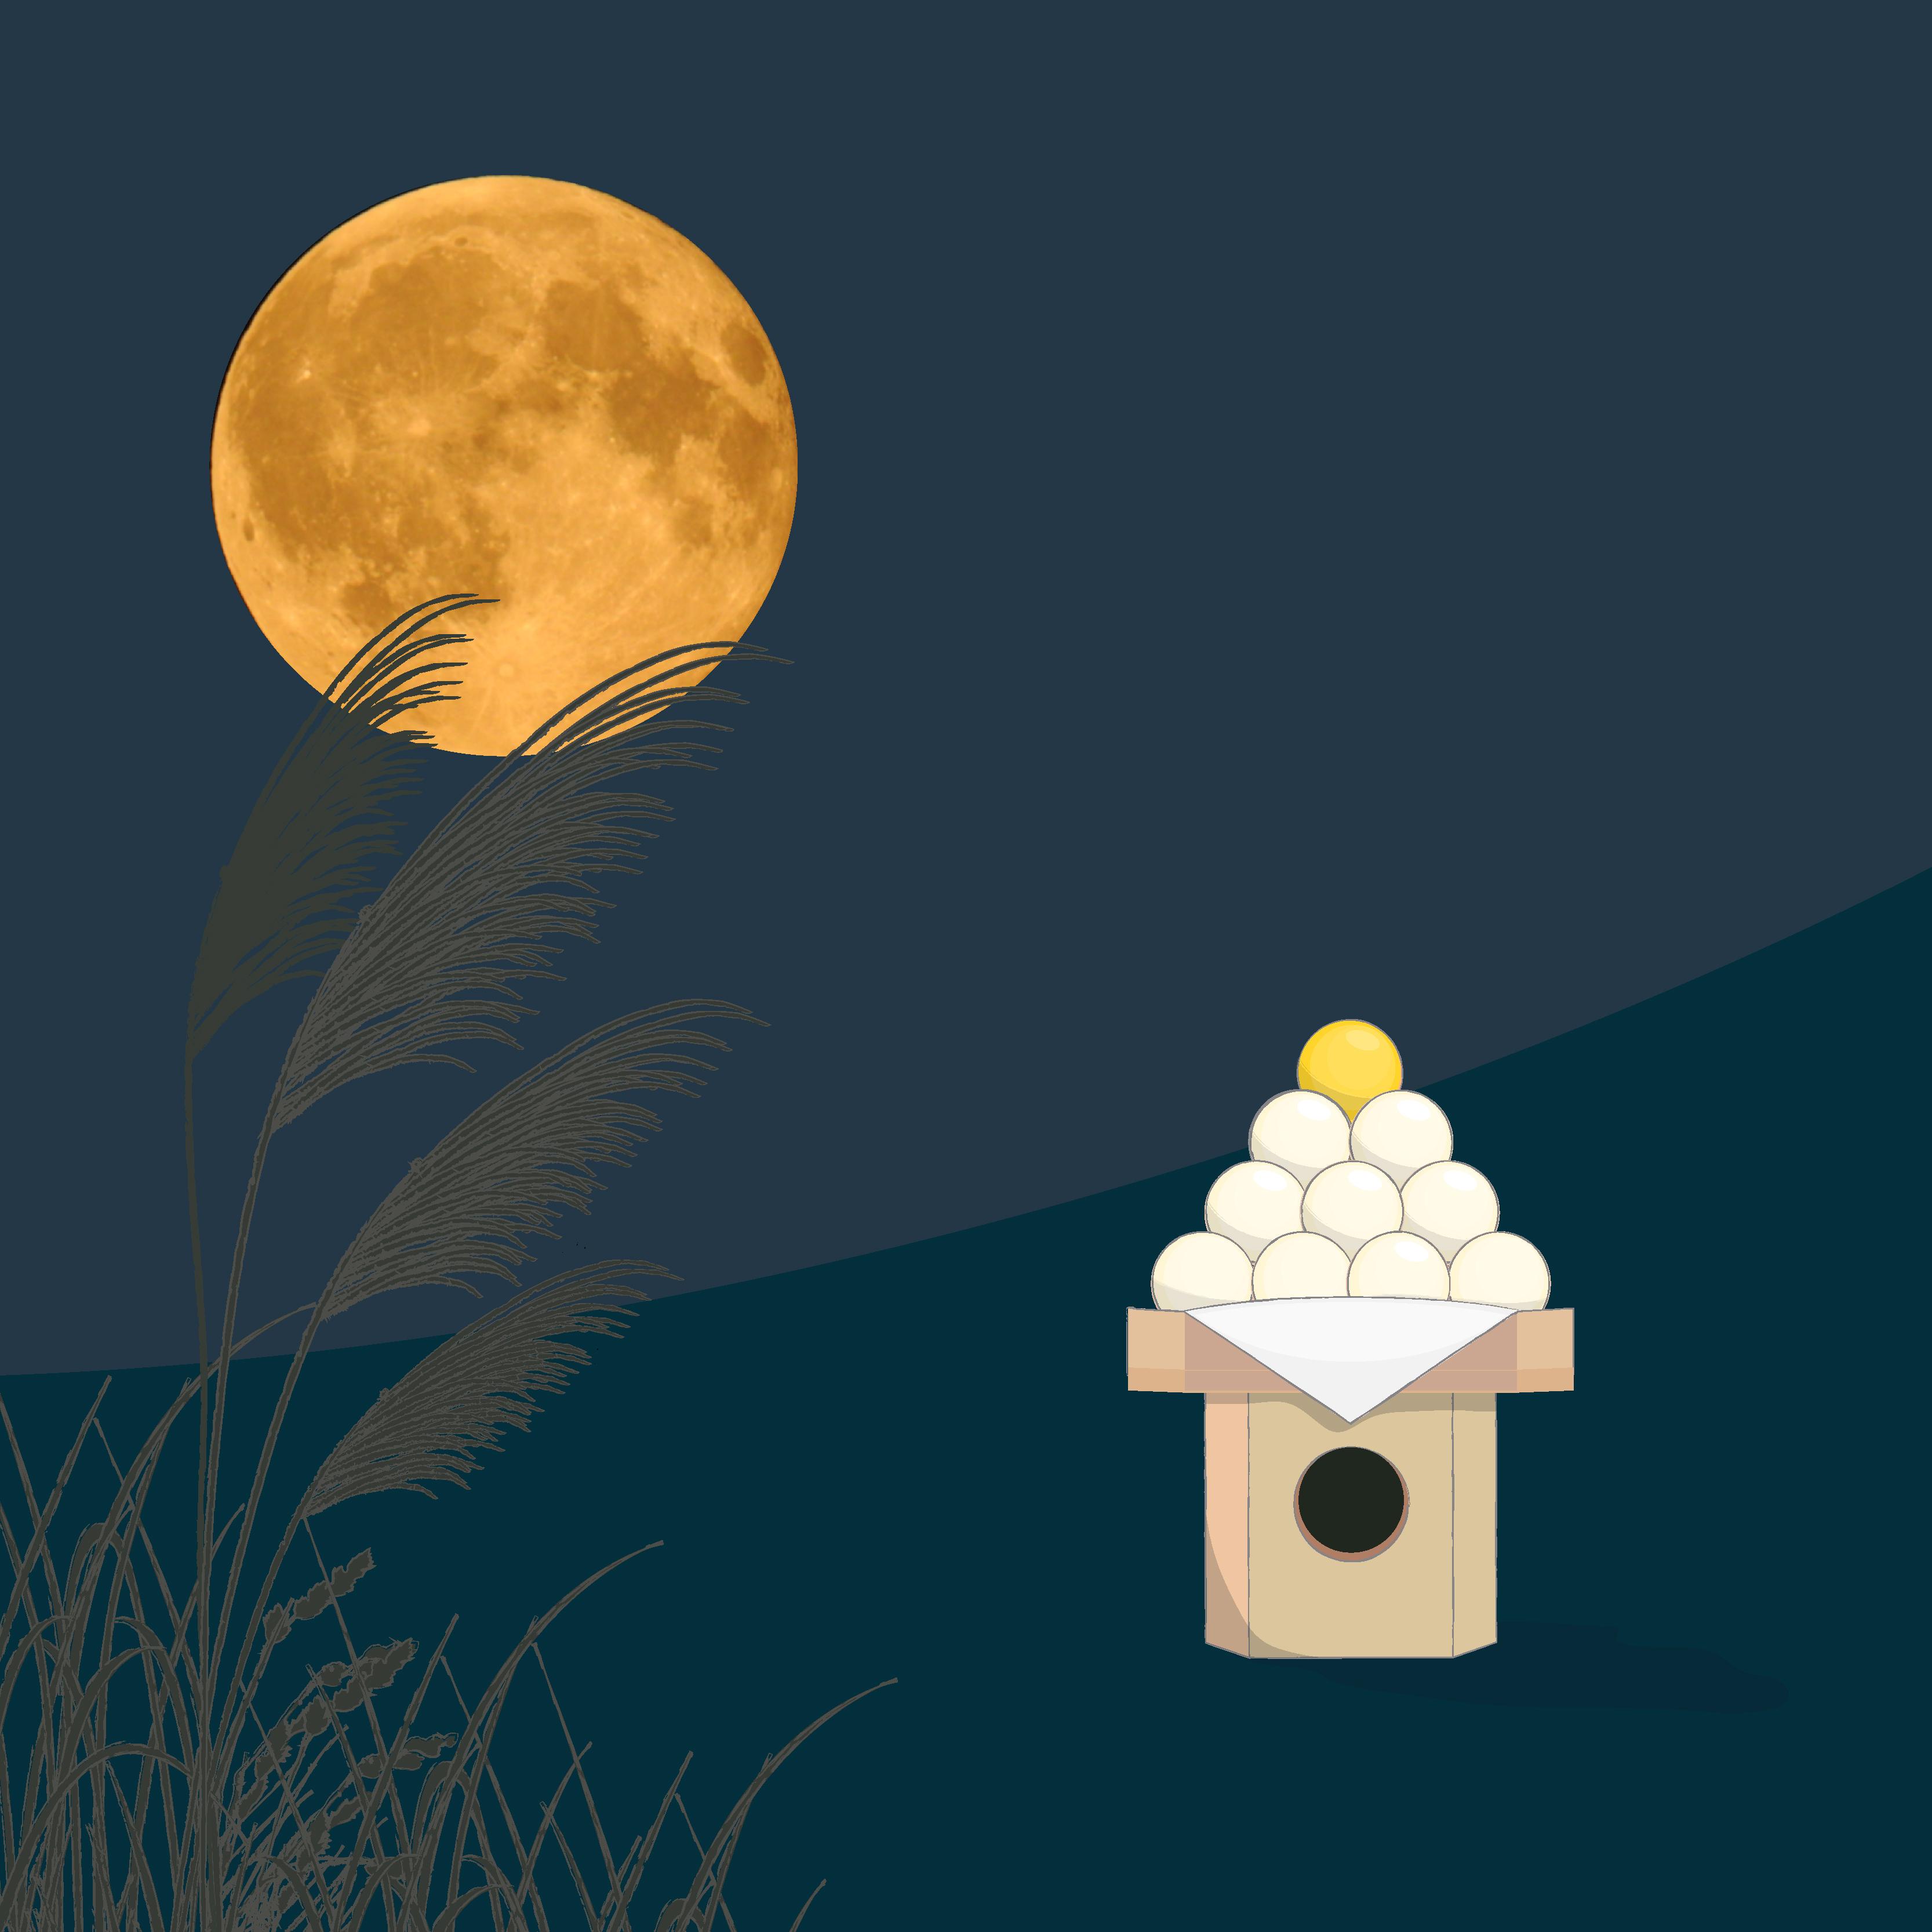 tsukimi-harvest-moon-viewing-01